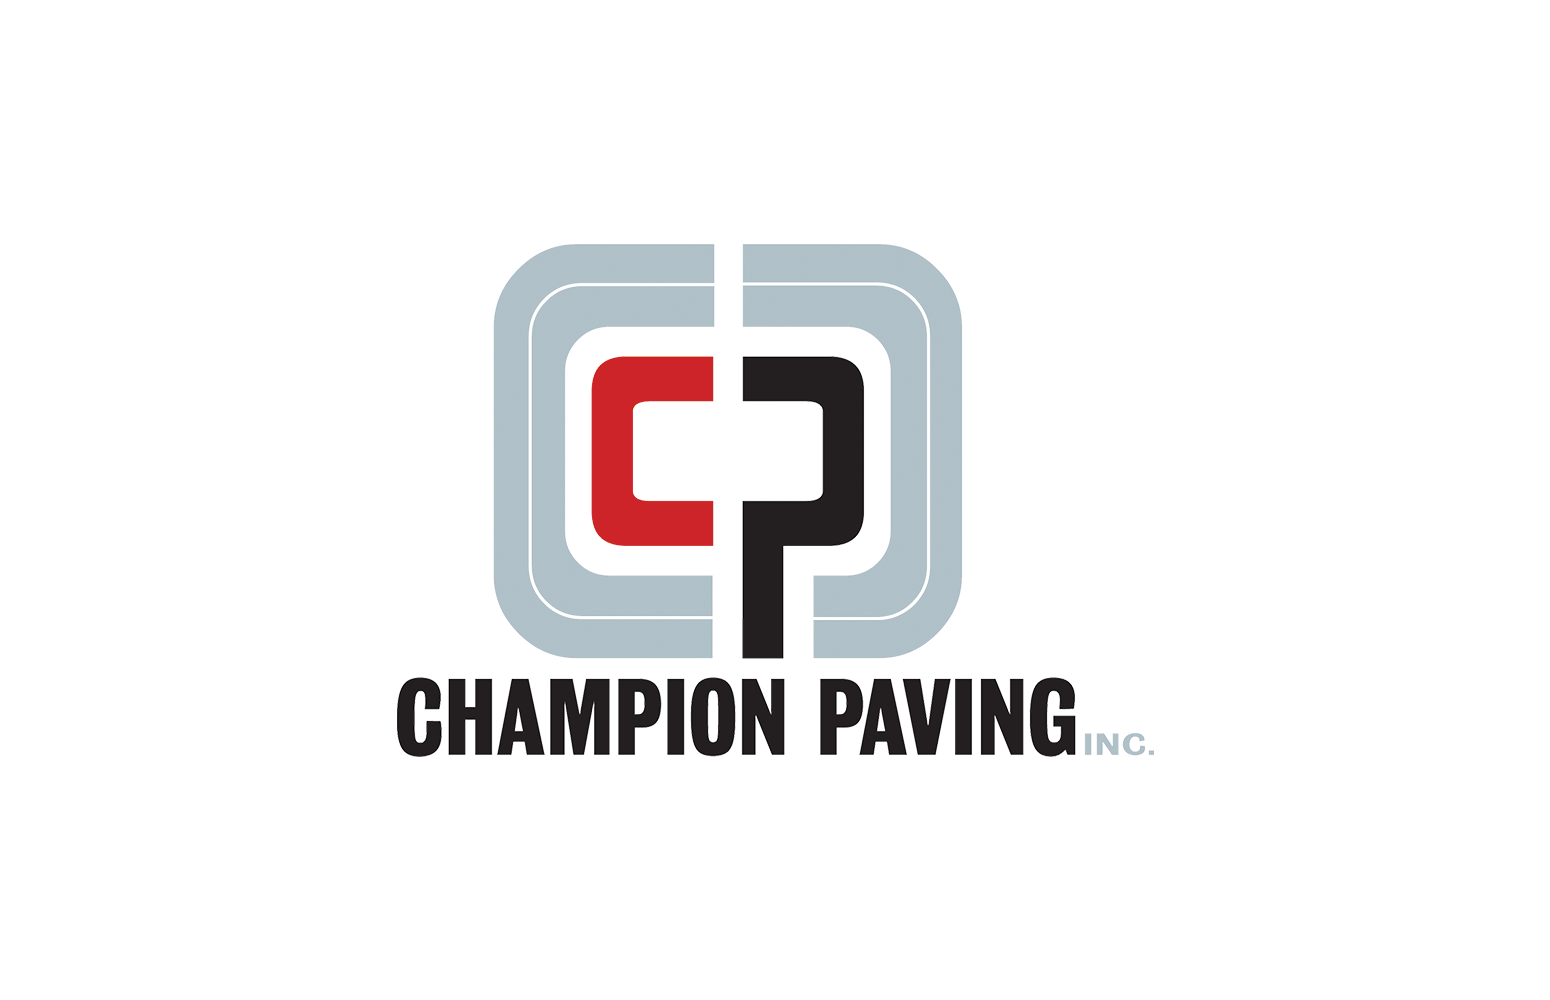 Champion Paving